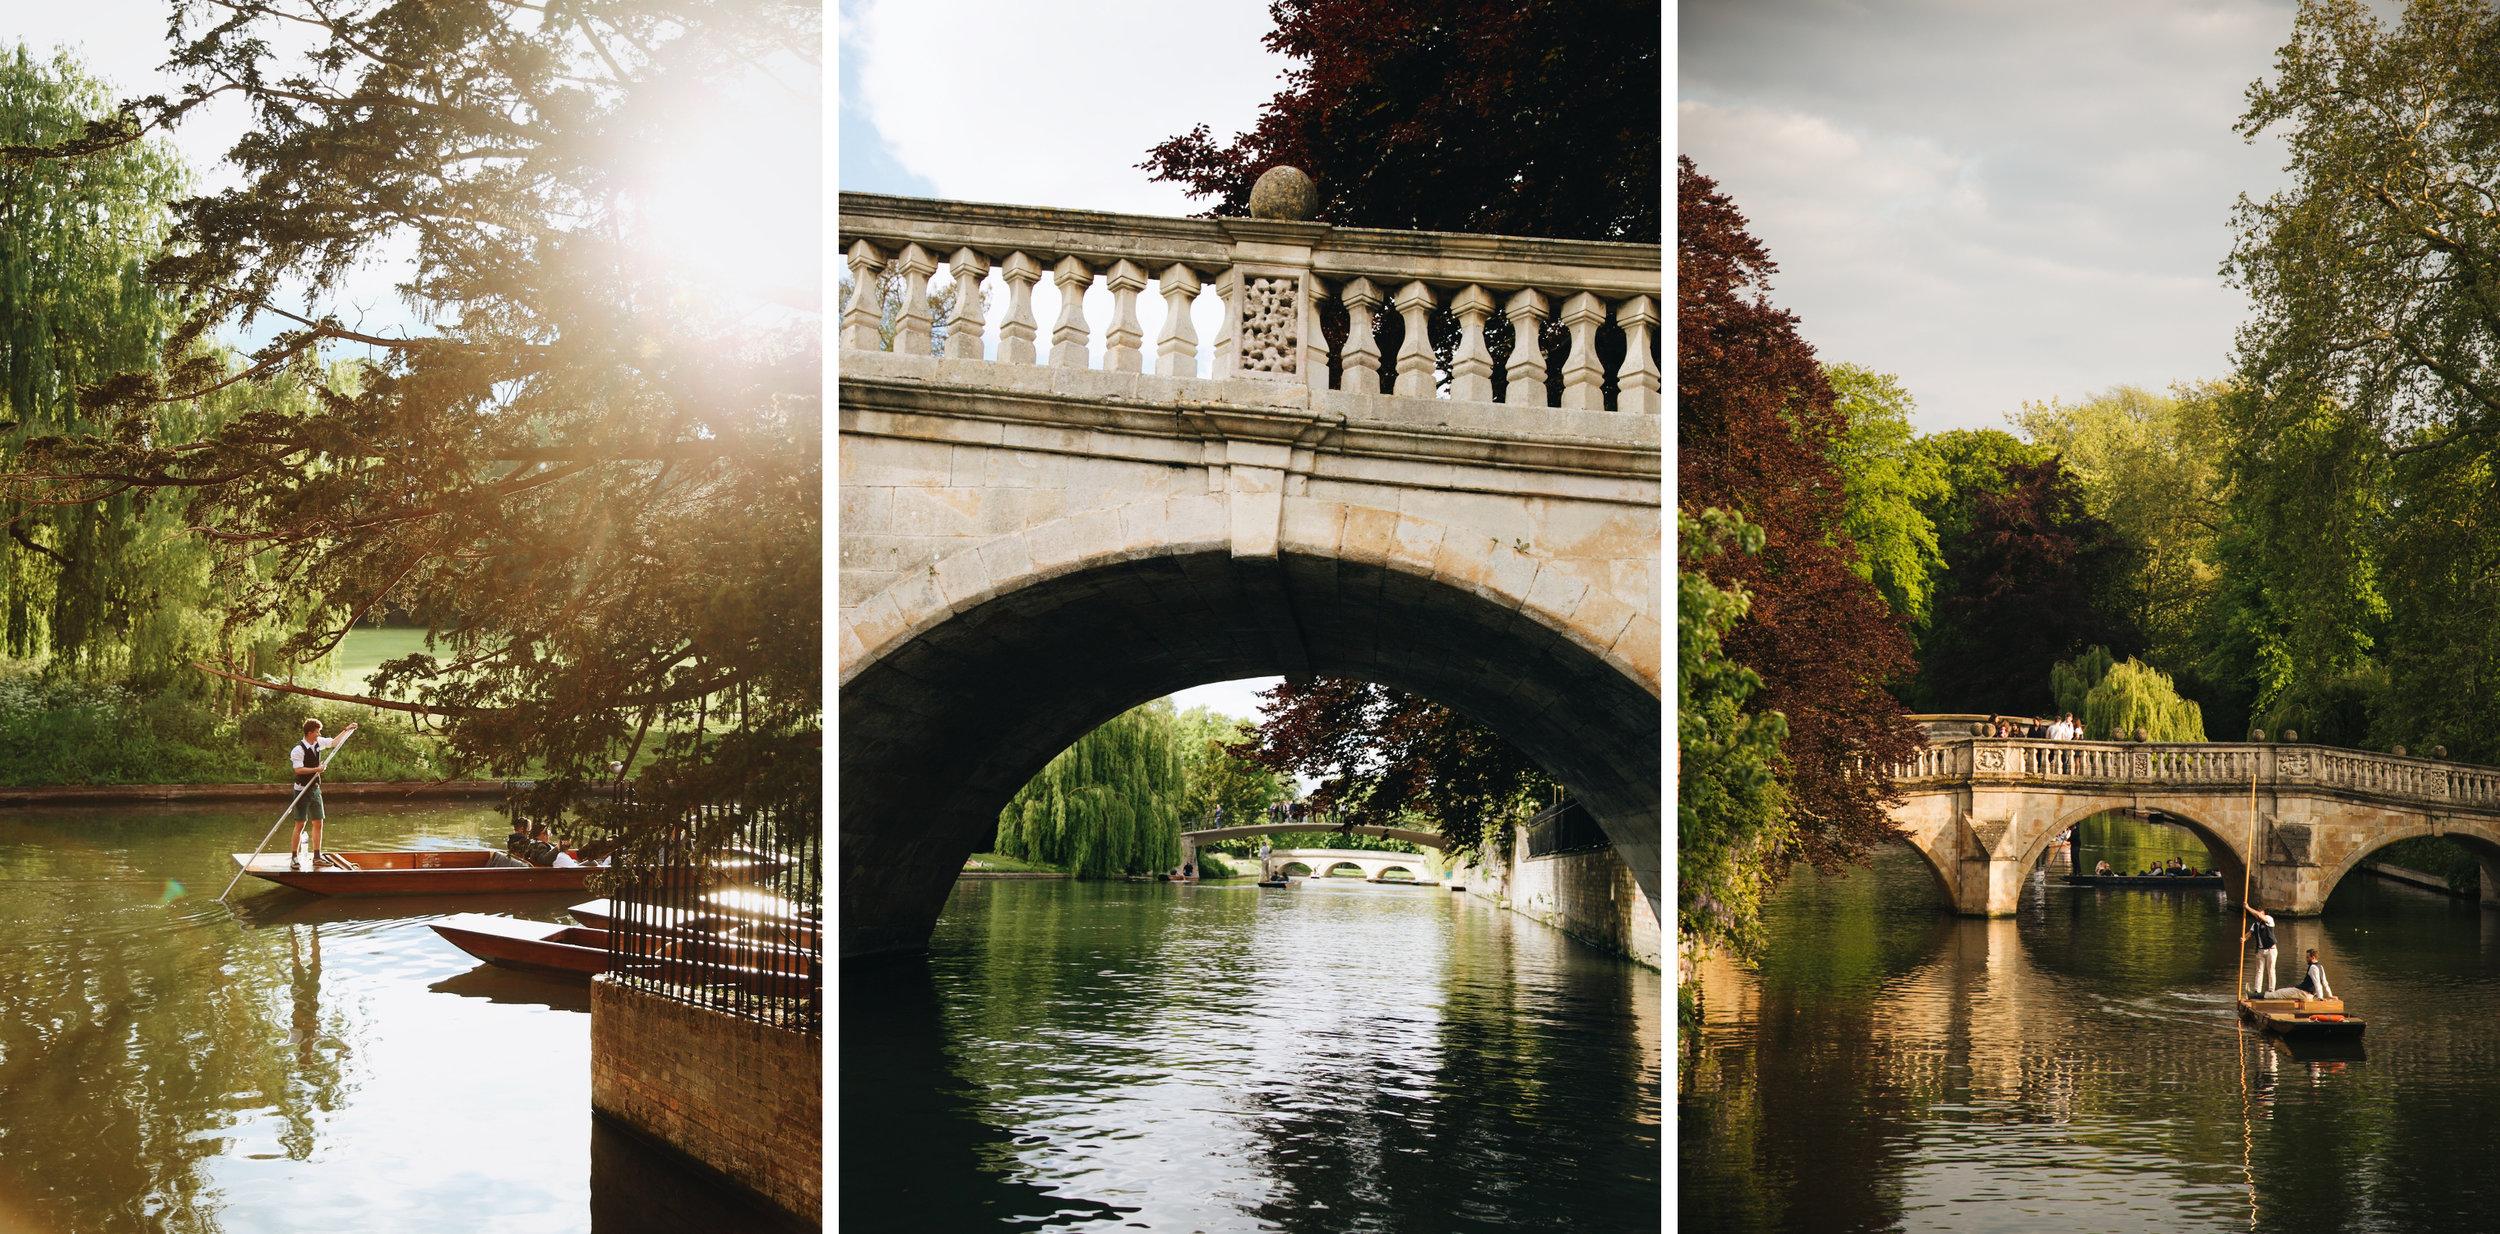 Balade-punt-cambridge-riviere-cam-voyage.jpg